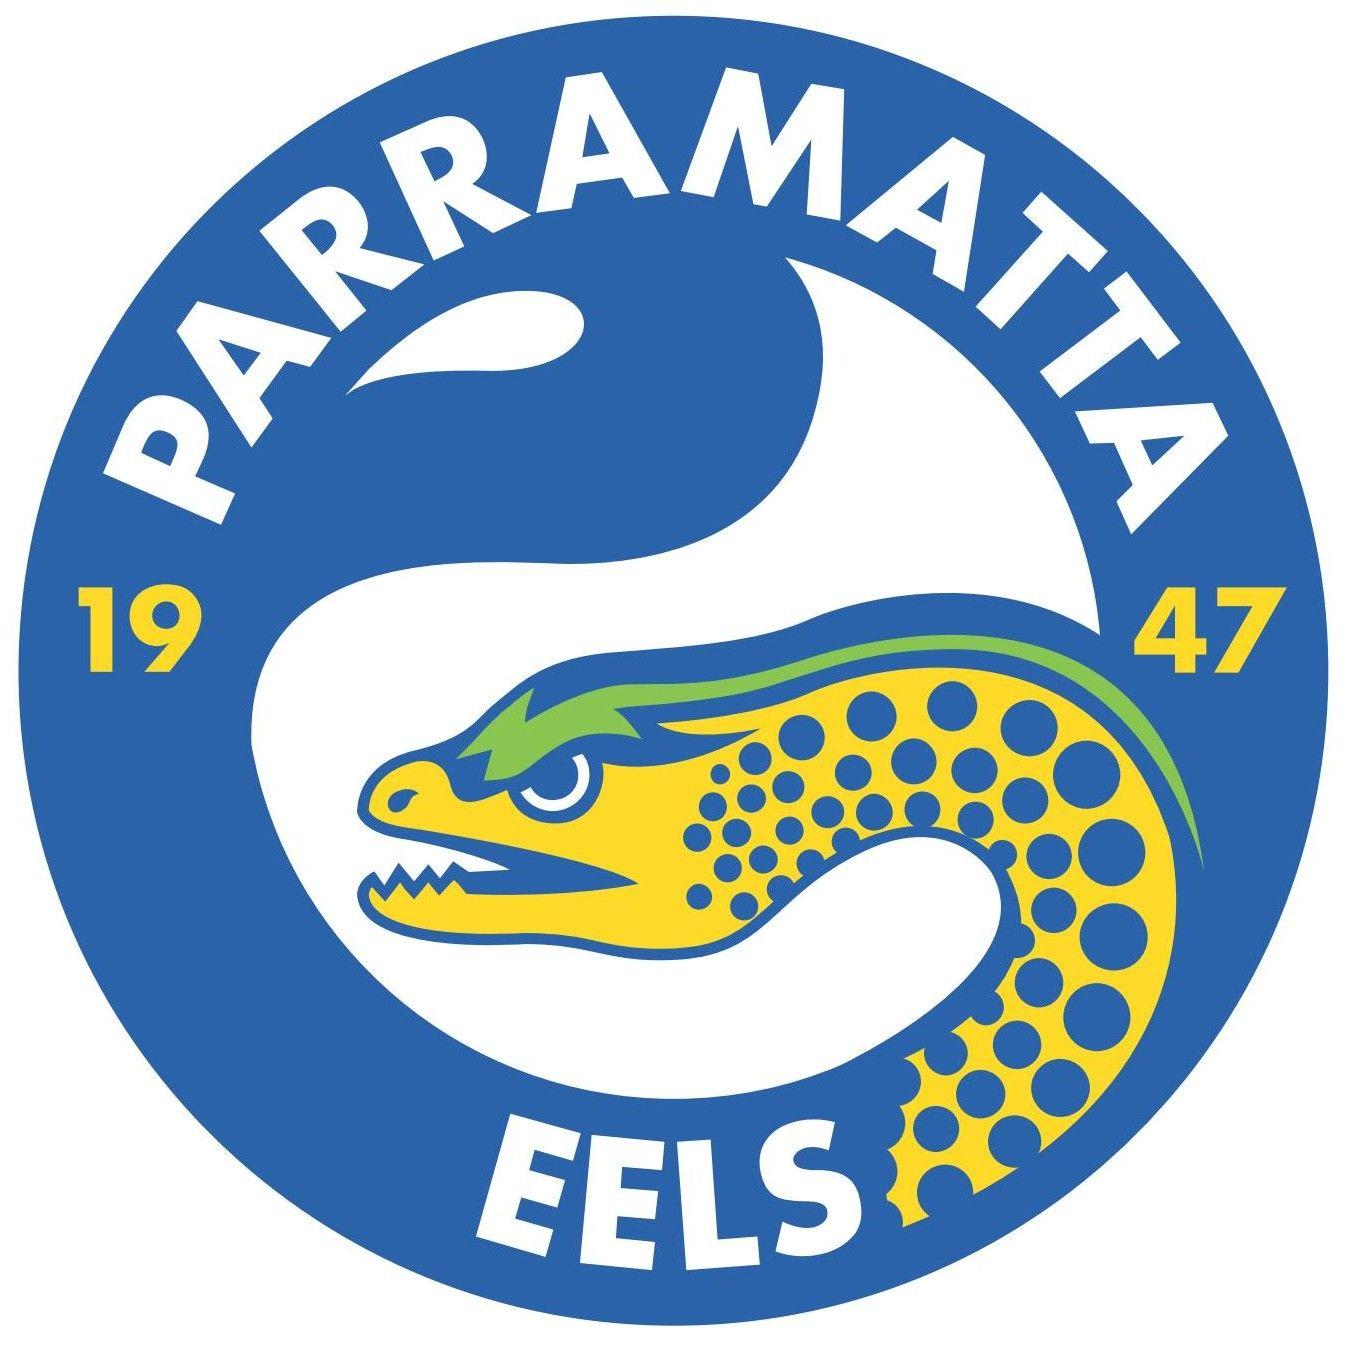 Parramatta Eels Logo Download Vector Sports logo, Nrl